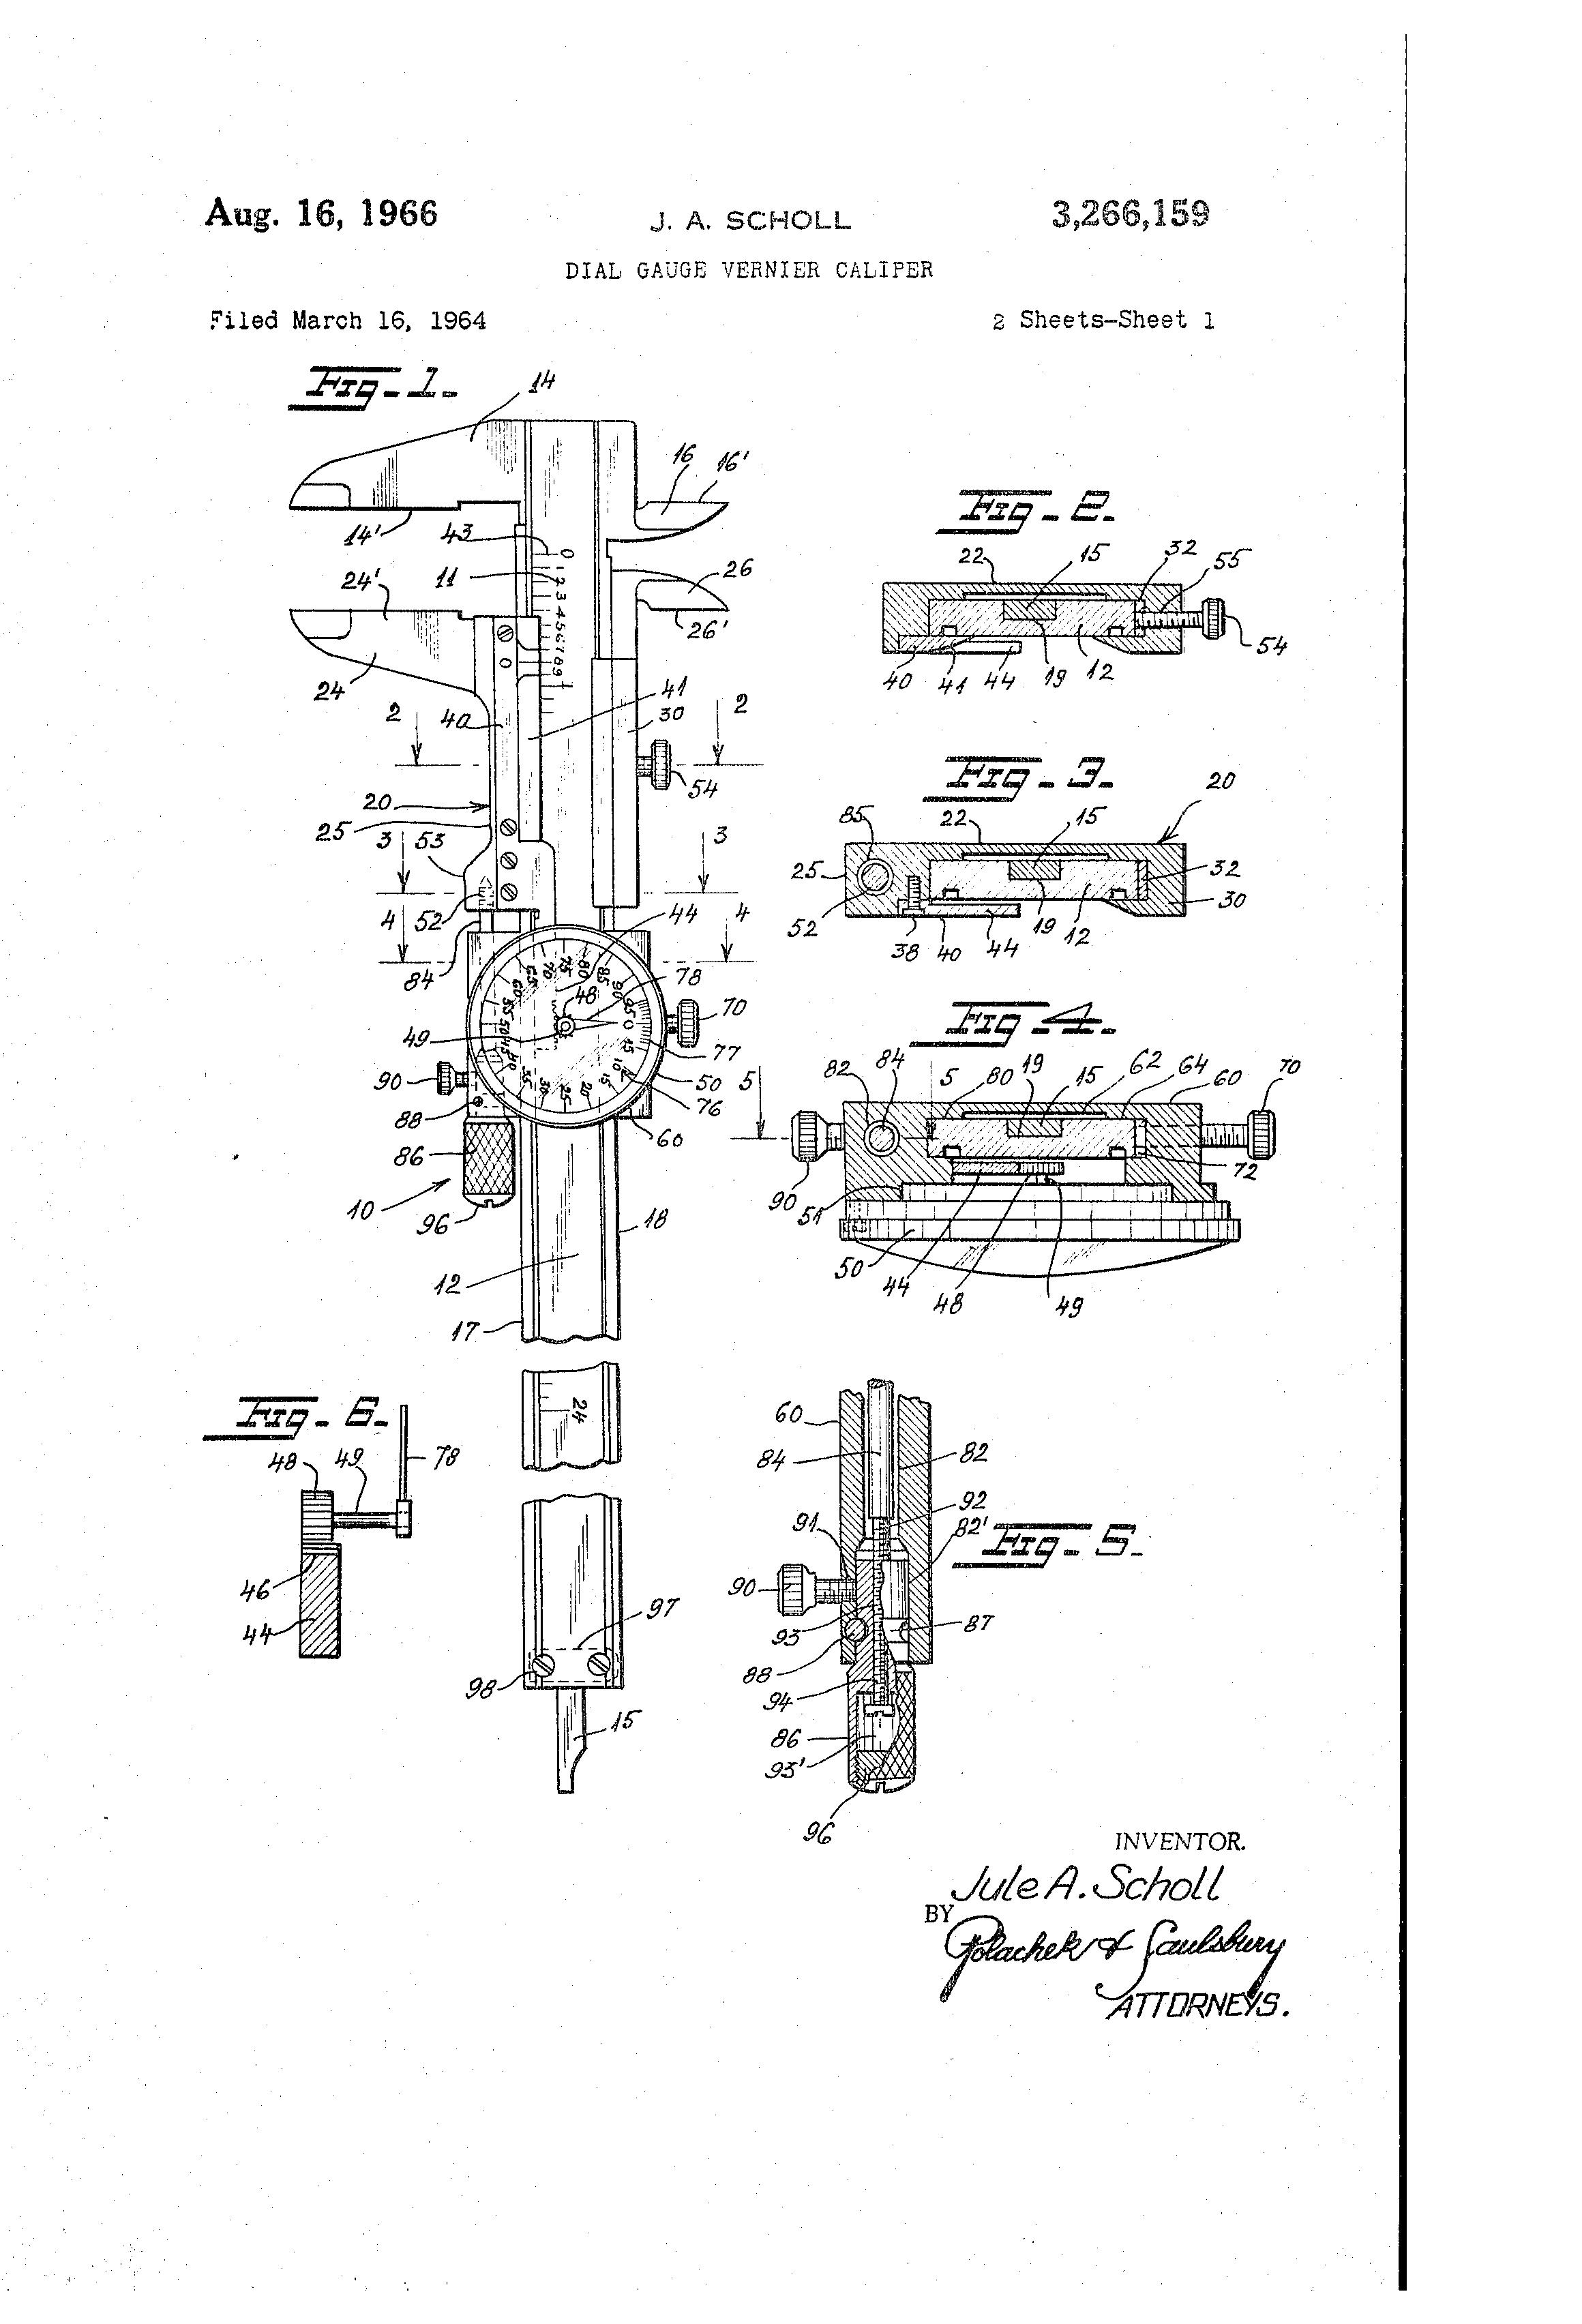 patent us3266159 - dial gauge vernier caliper